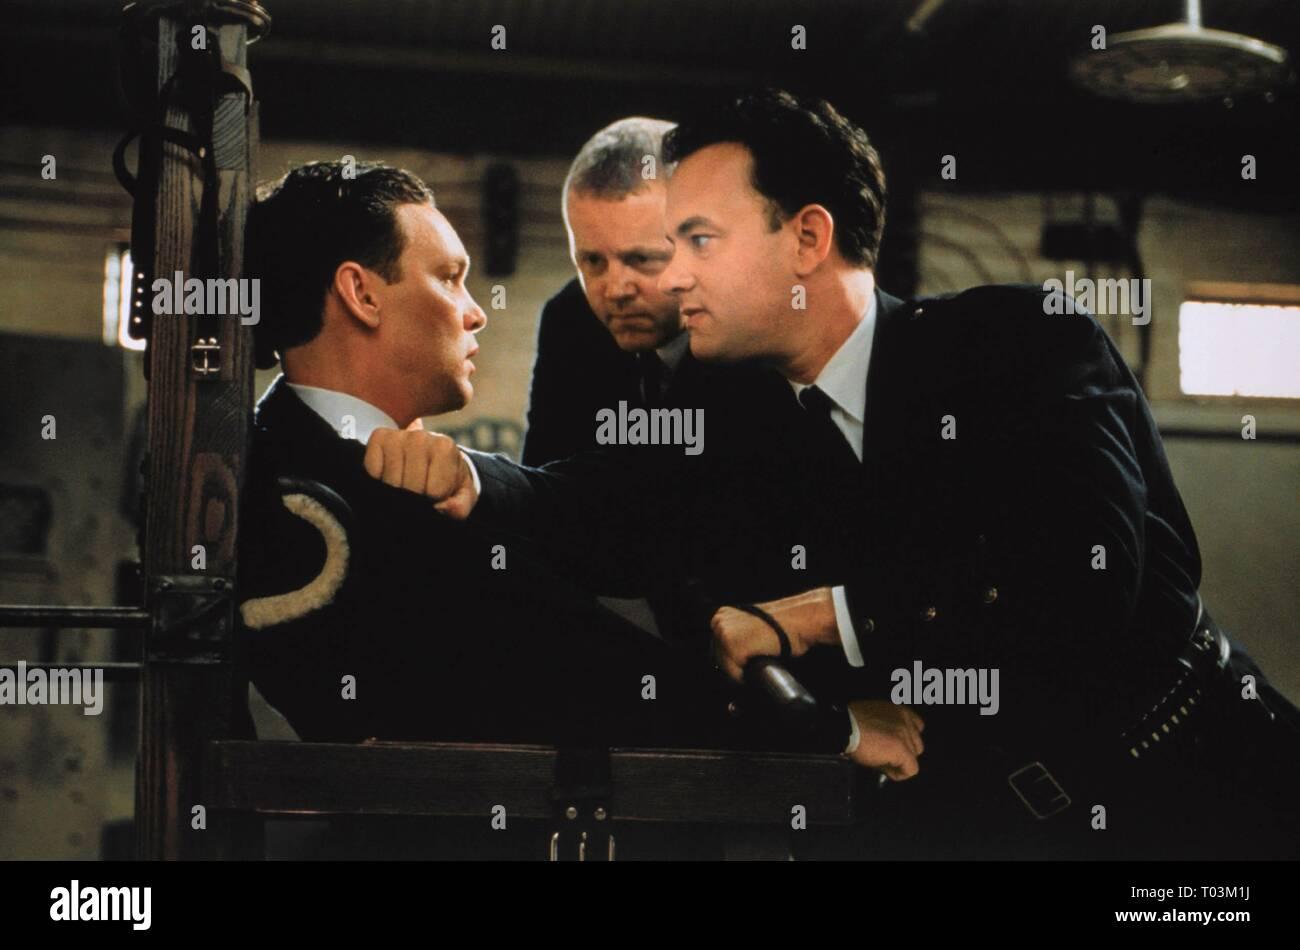 DOUG HUTCHISON, DAVID MORSE, TOM HANKS, THE GREEN MILE, 1999 - Stock Image